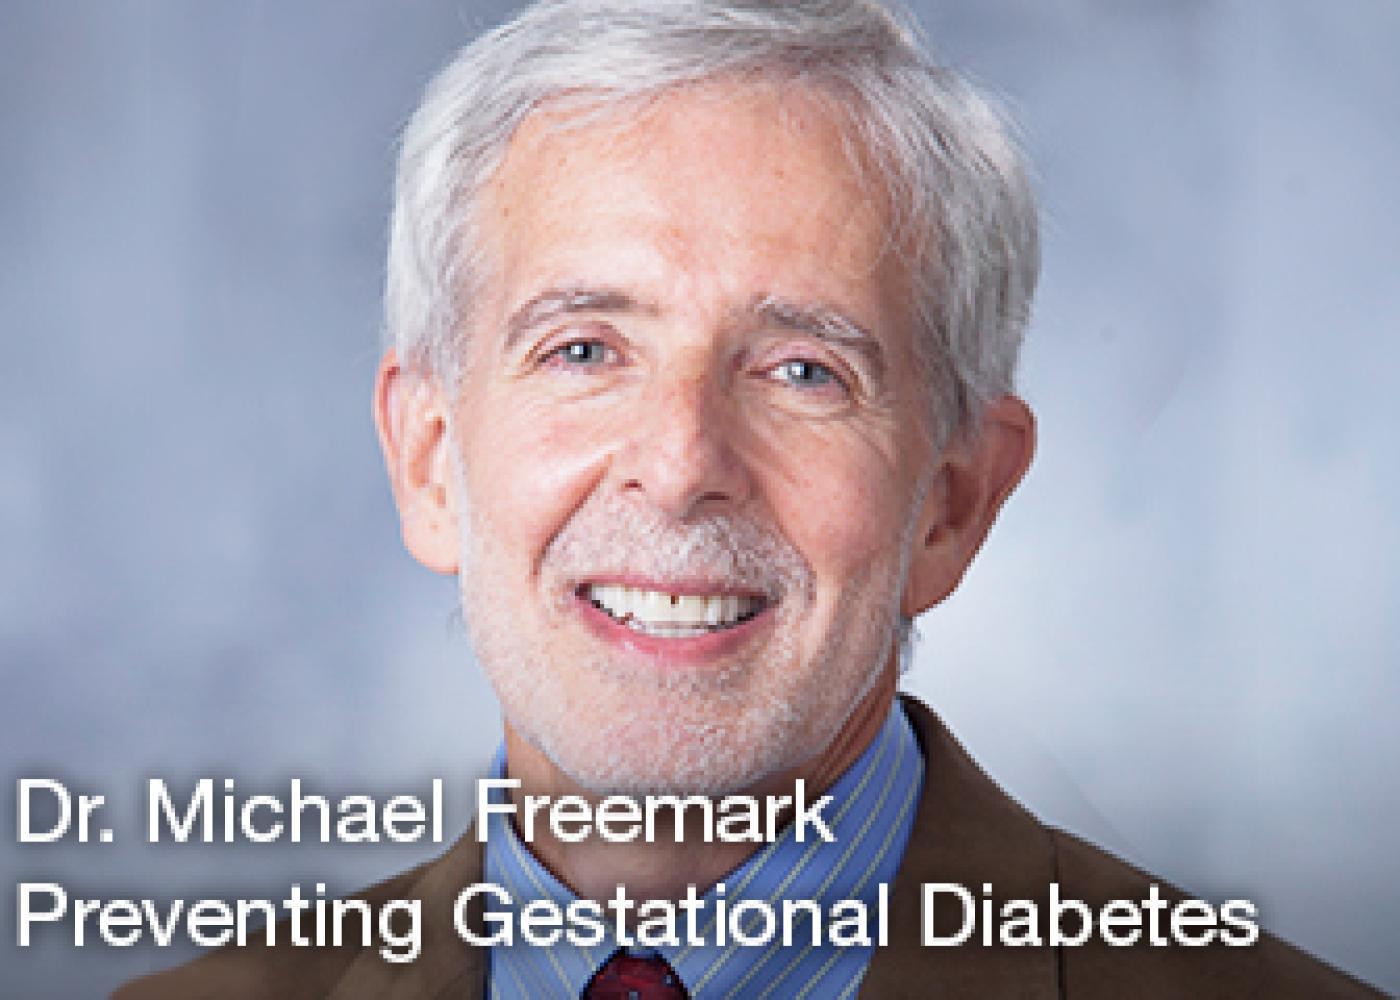 Michael Freemark